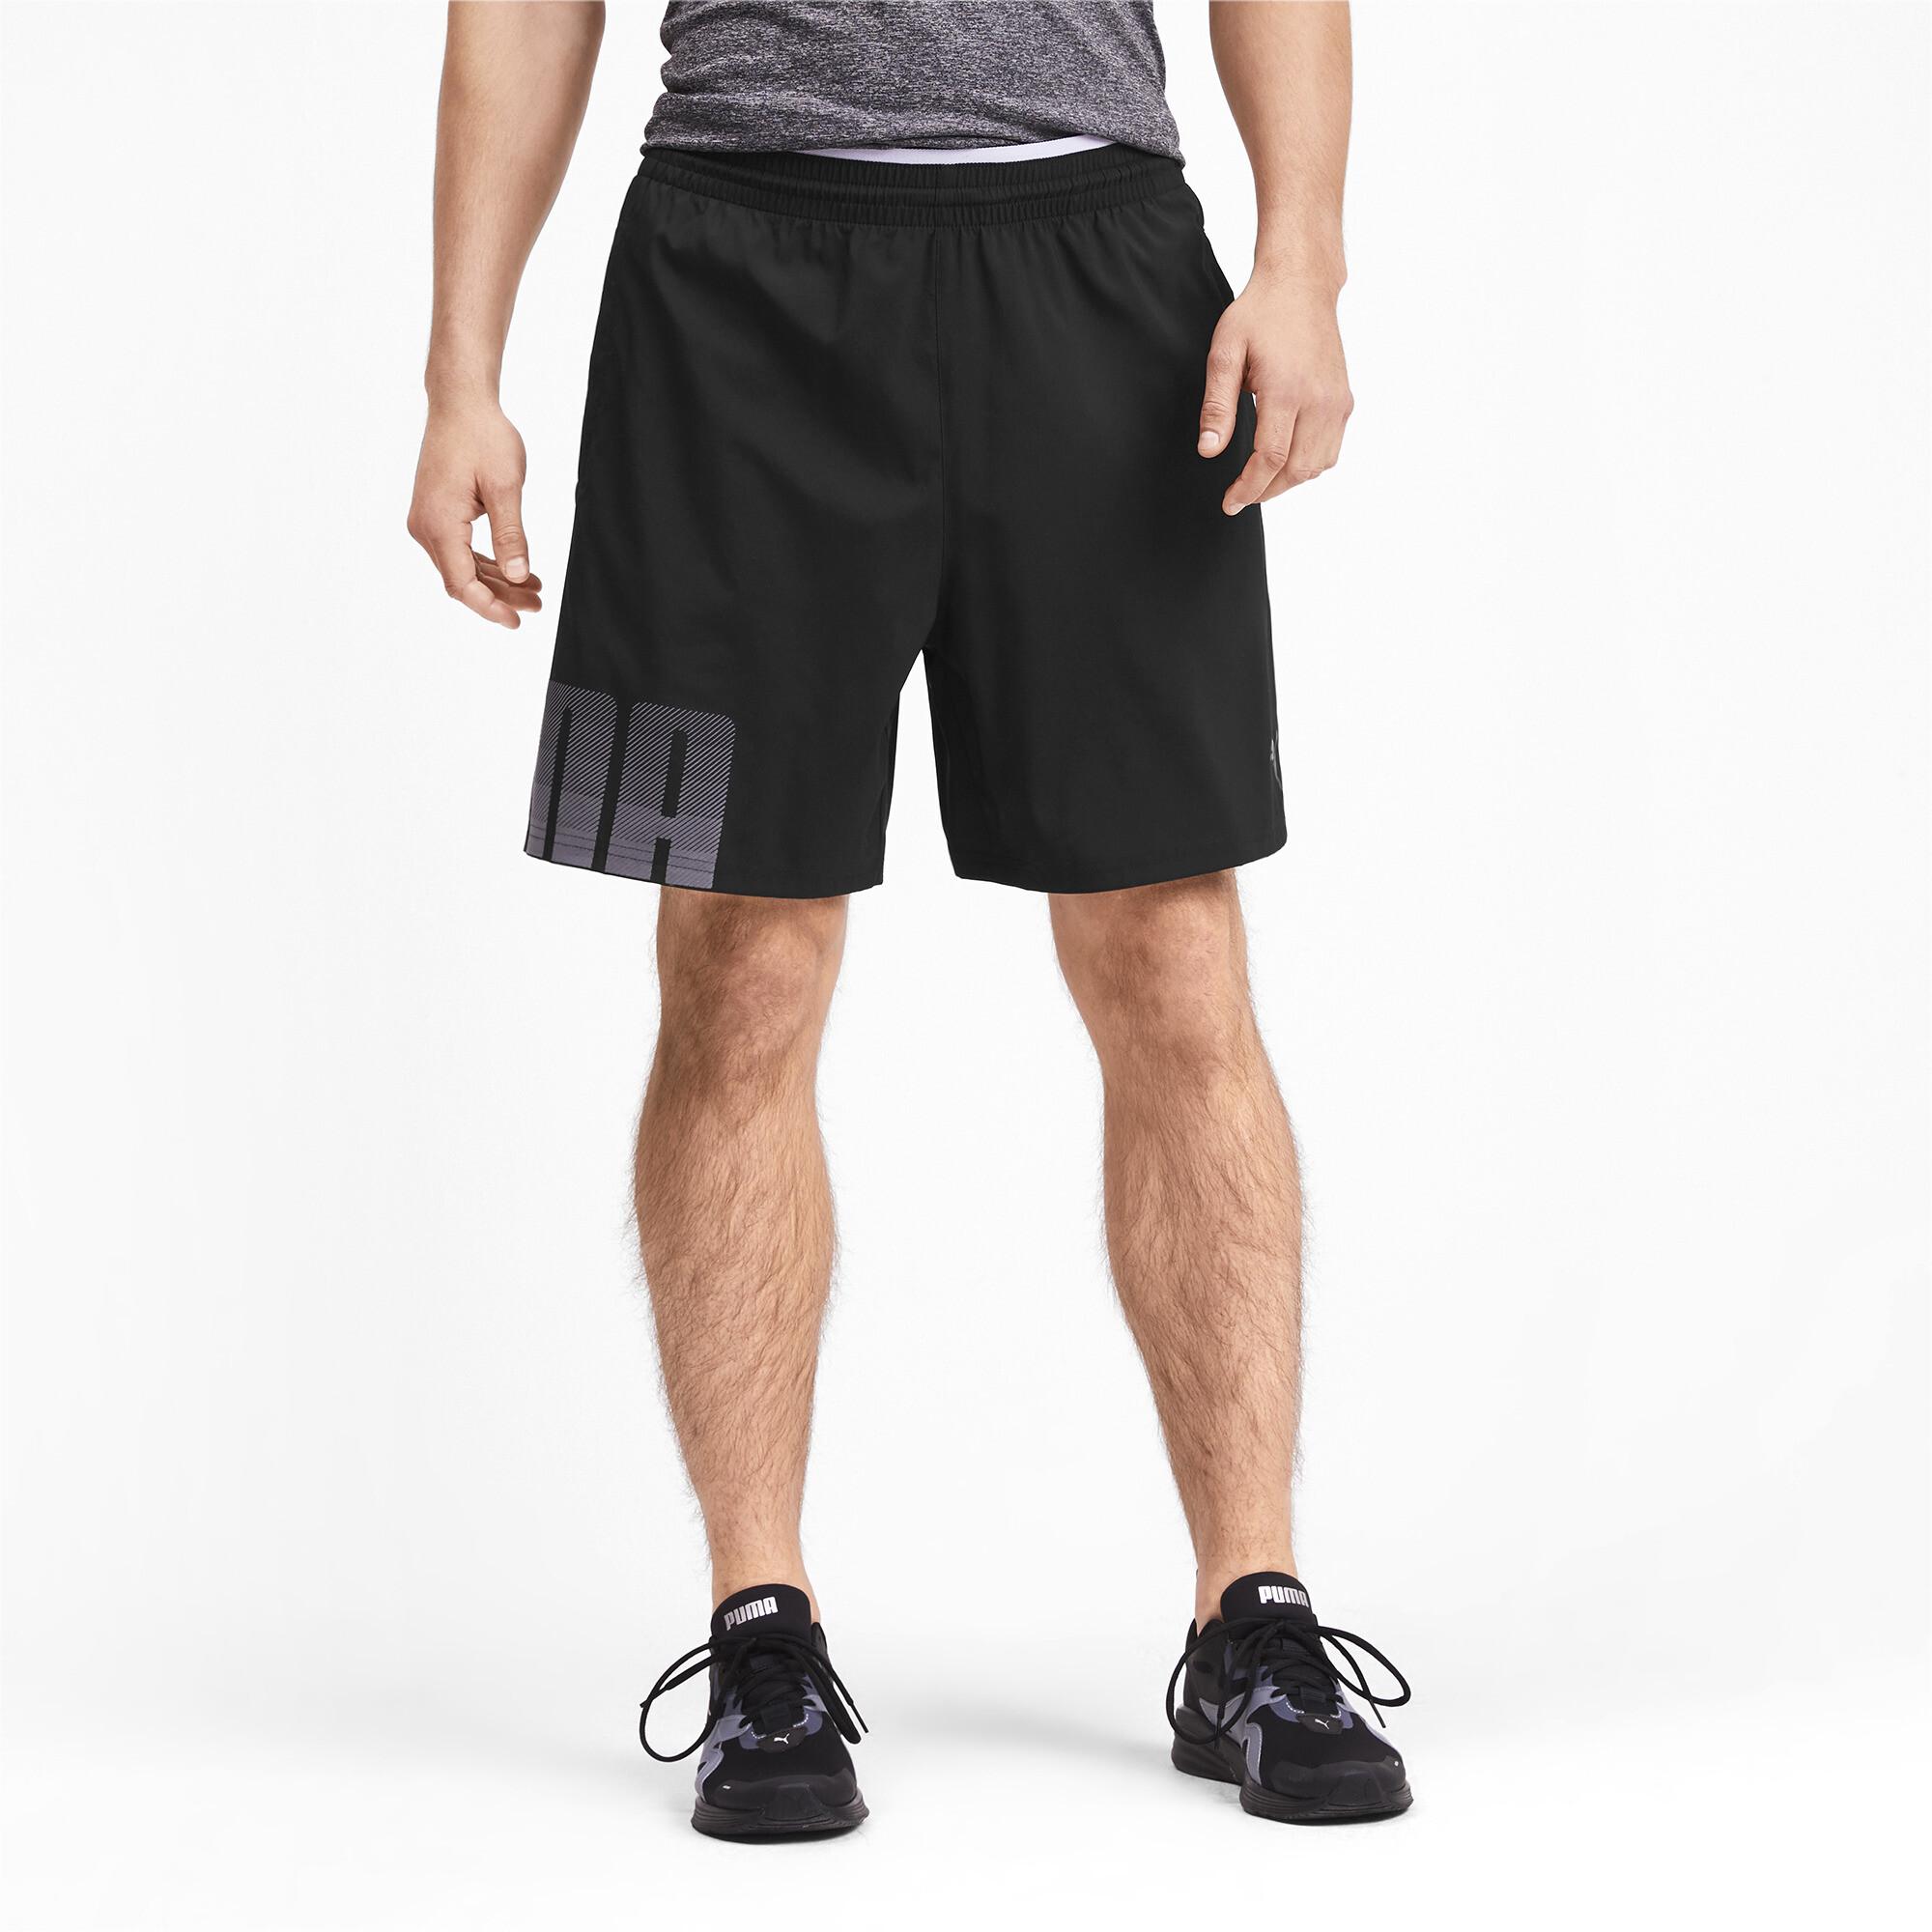 PUMA Collective Herren Training Gewebte Shorts Männer Webshorts Training Neu